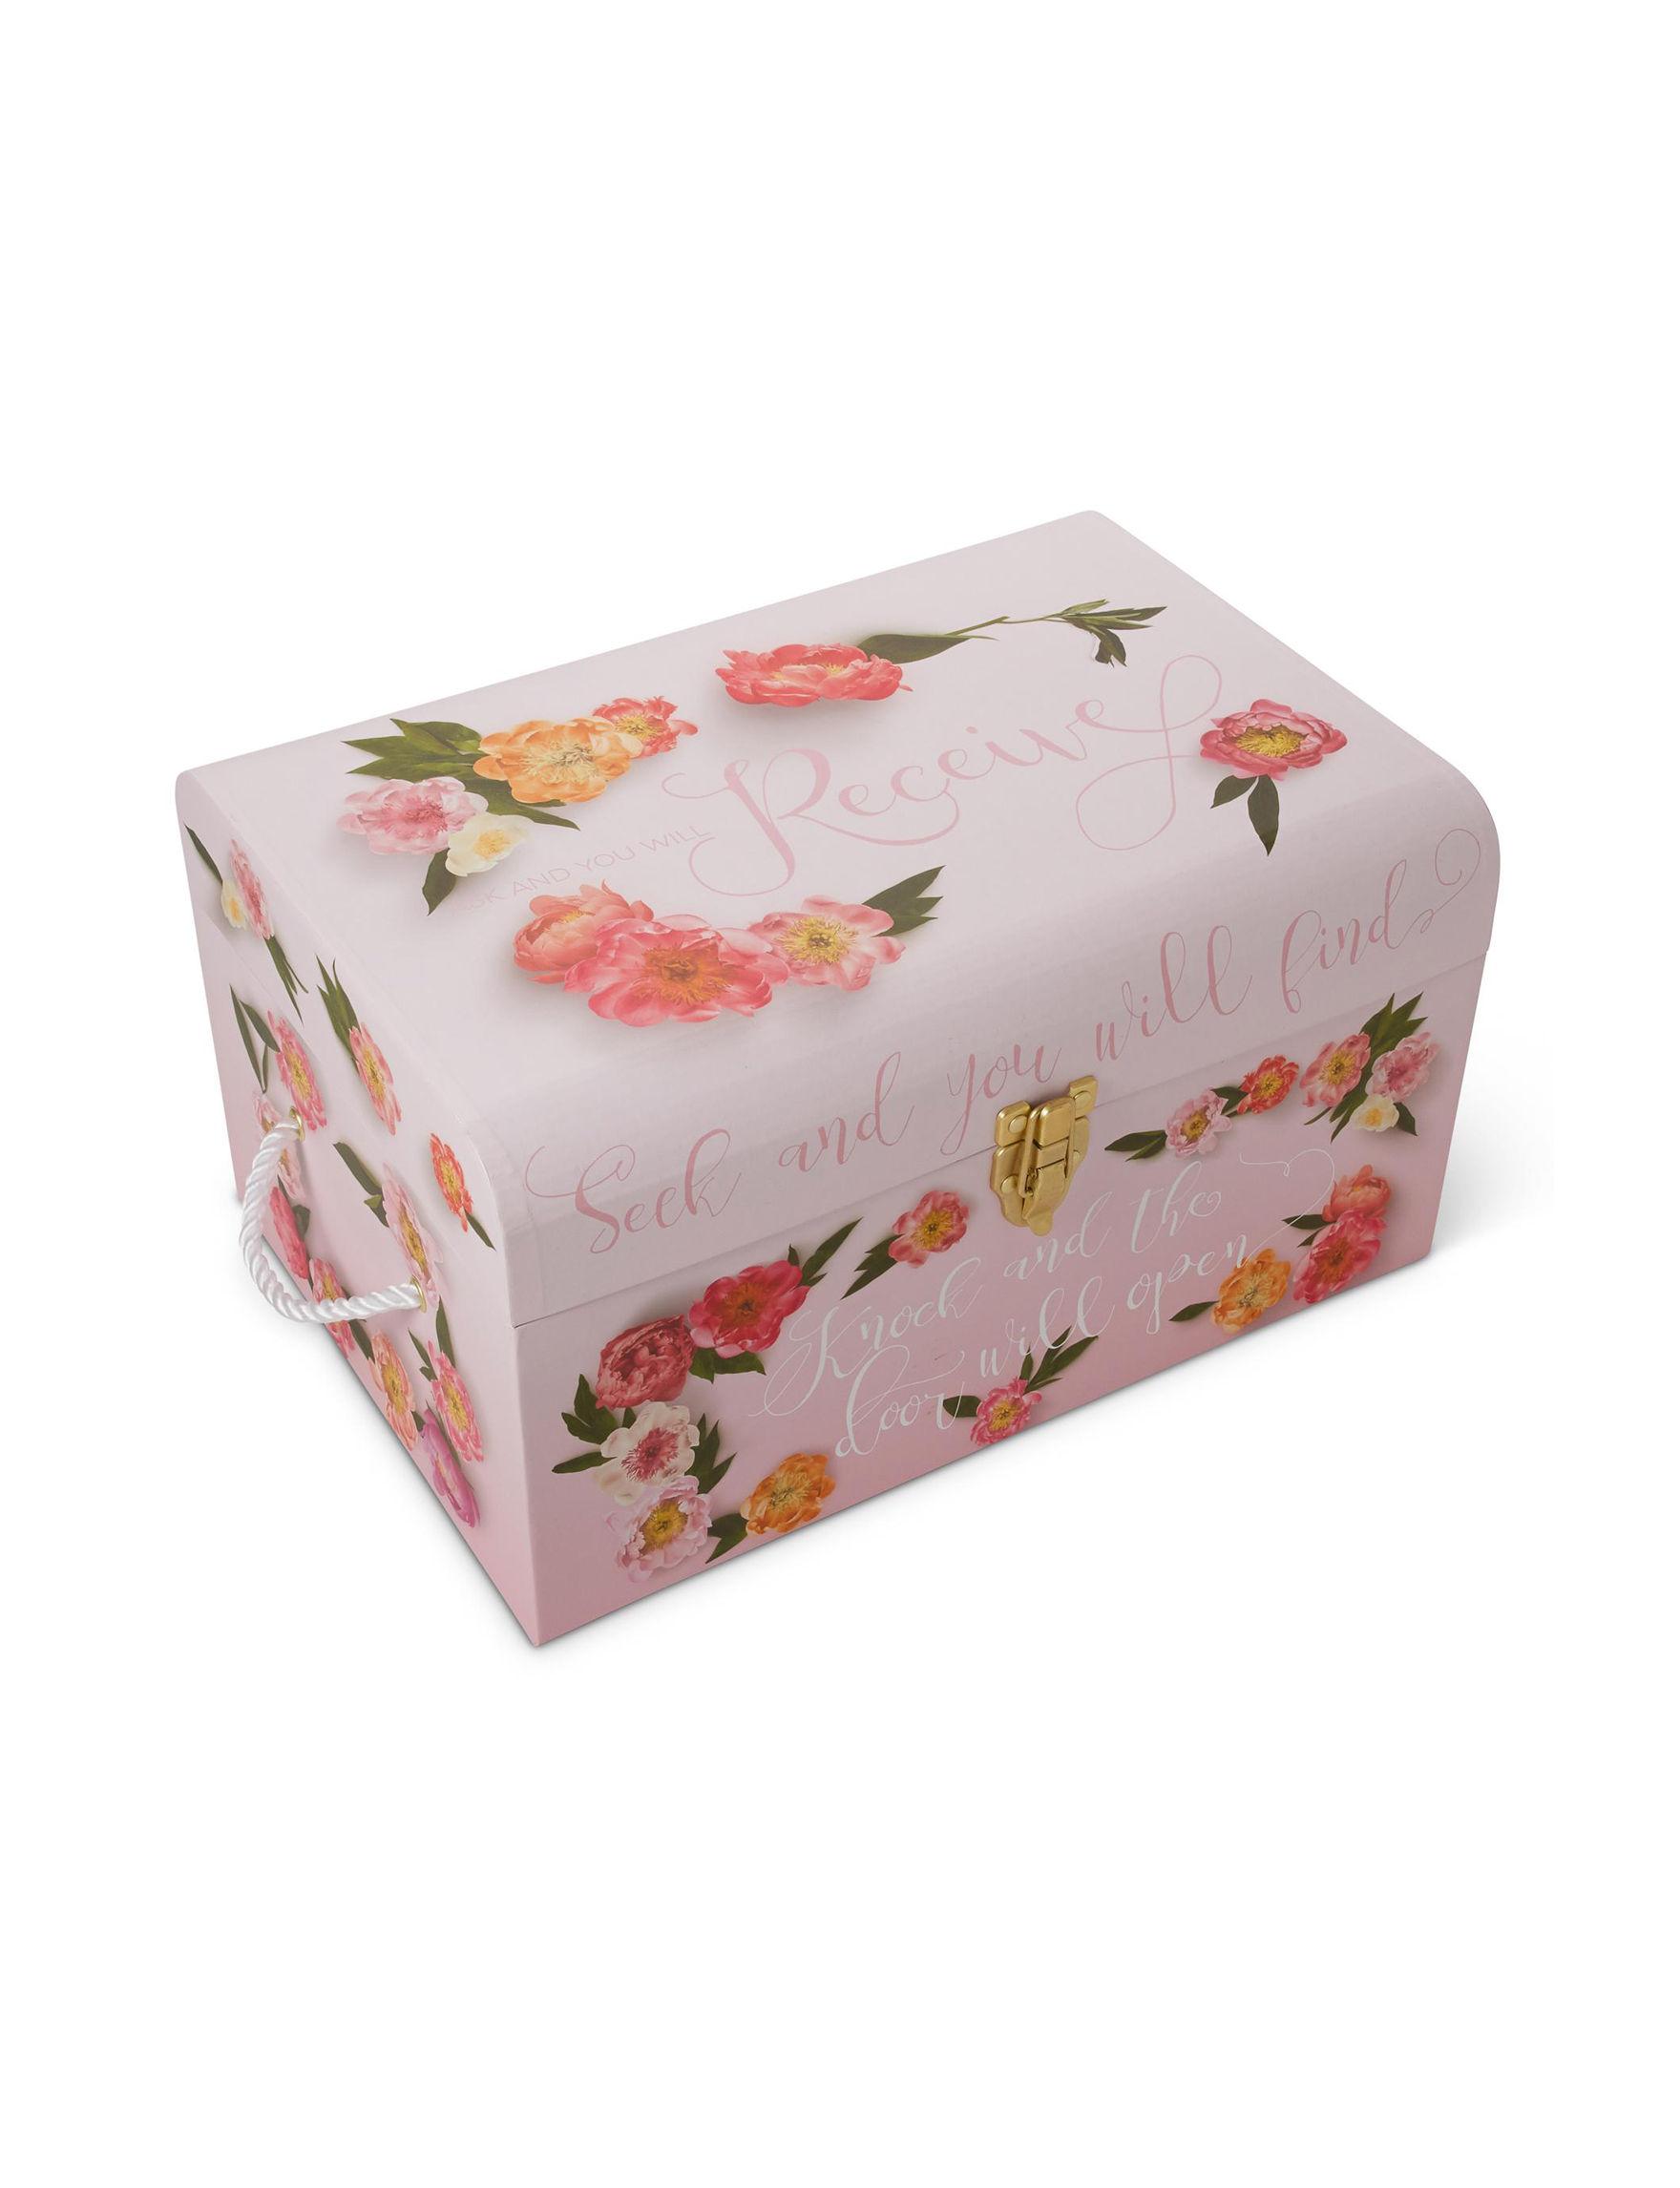 Tri Coastal Purple Floral Decorative Objects Storage & Organization